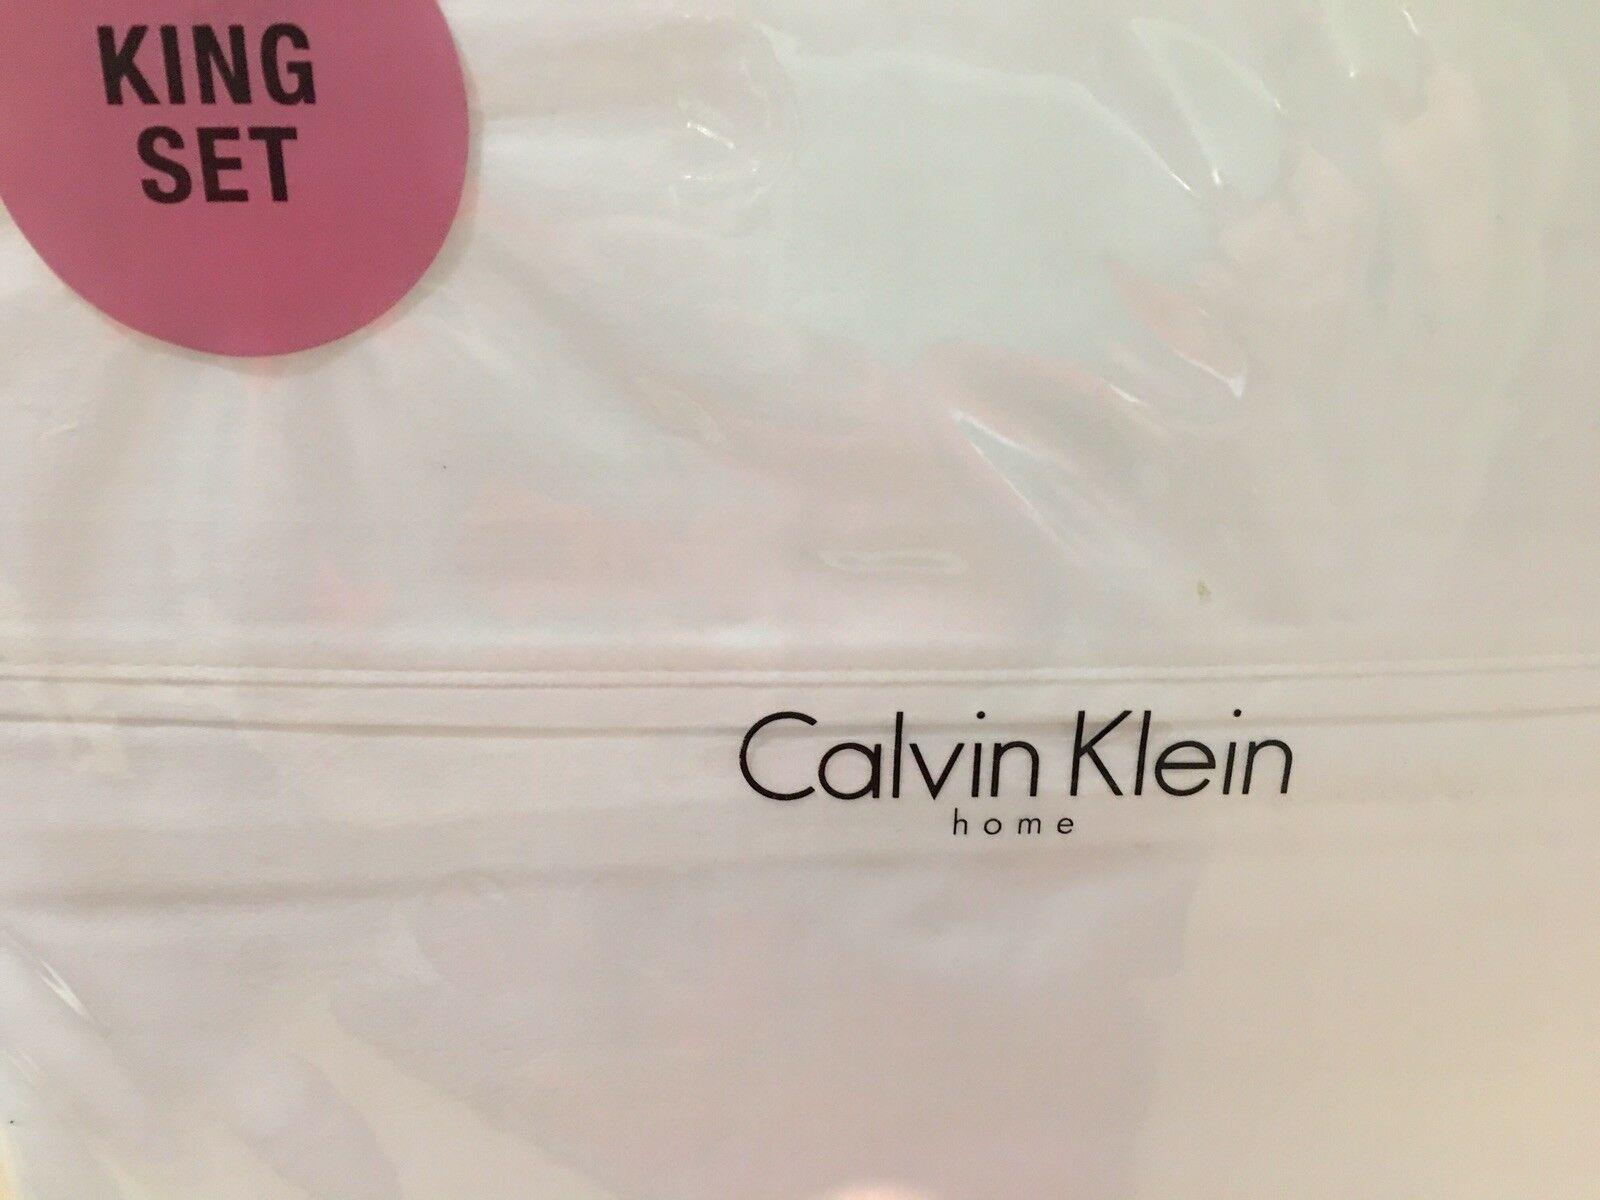 "CALVIN KLEIN HOME ""SAND"" 4pc  QUEEN  SHEET SET  SWEN IN  USA  BNIP - $187.15"